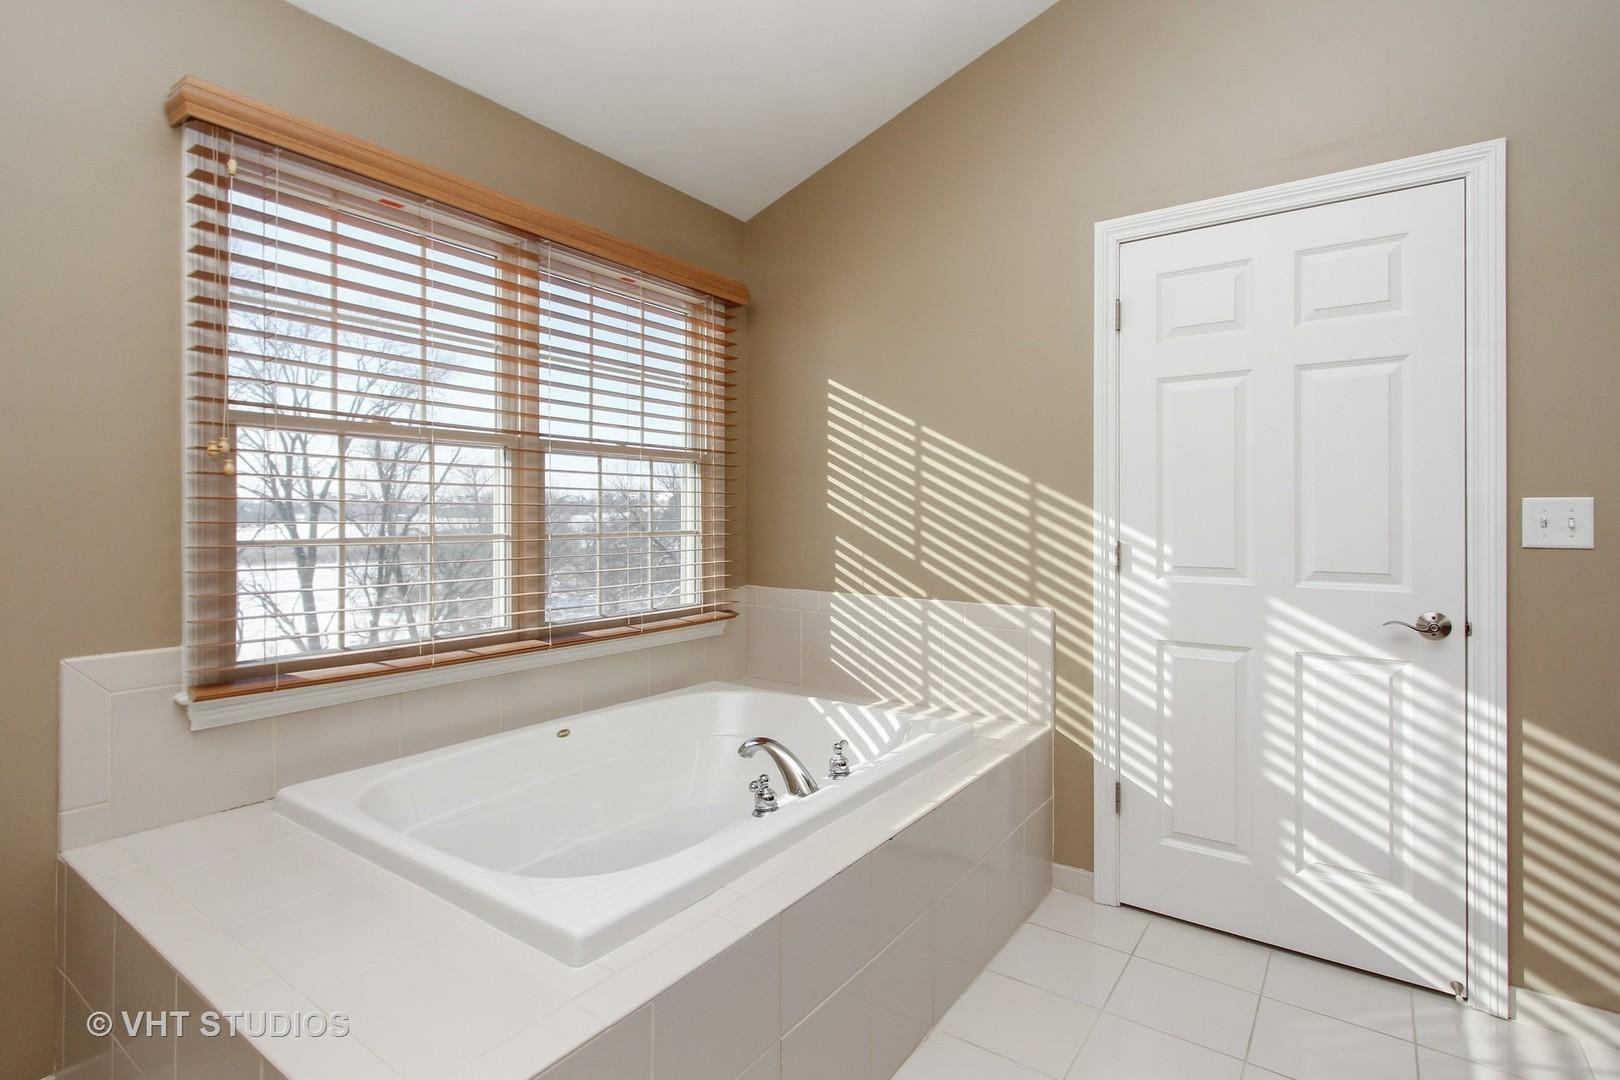 27 Harborside WAY, Hawthorn Woods, IL 60047 $269,900 MLS#09853700 ...